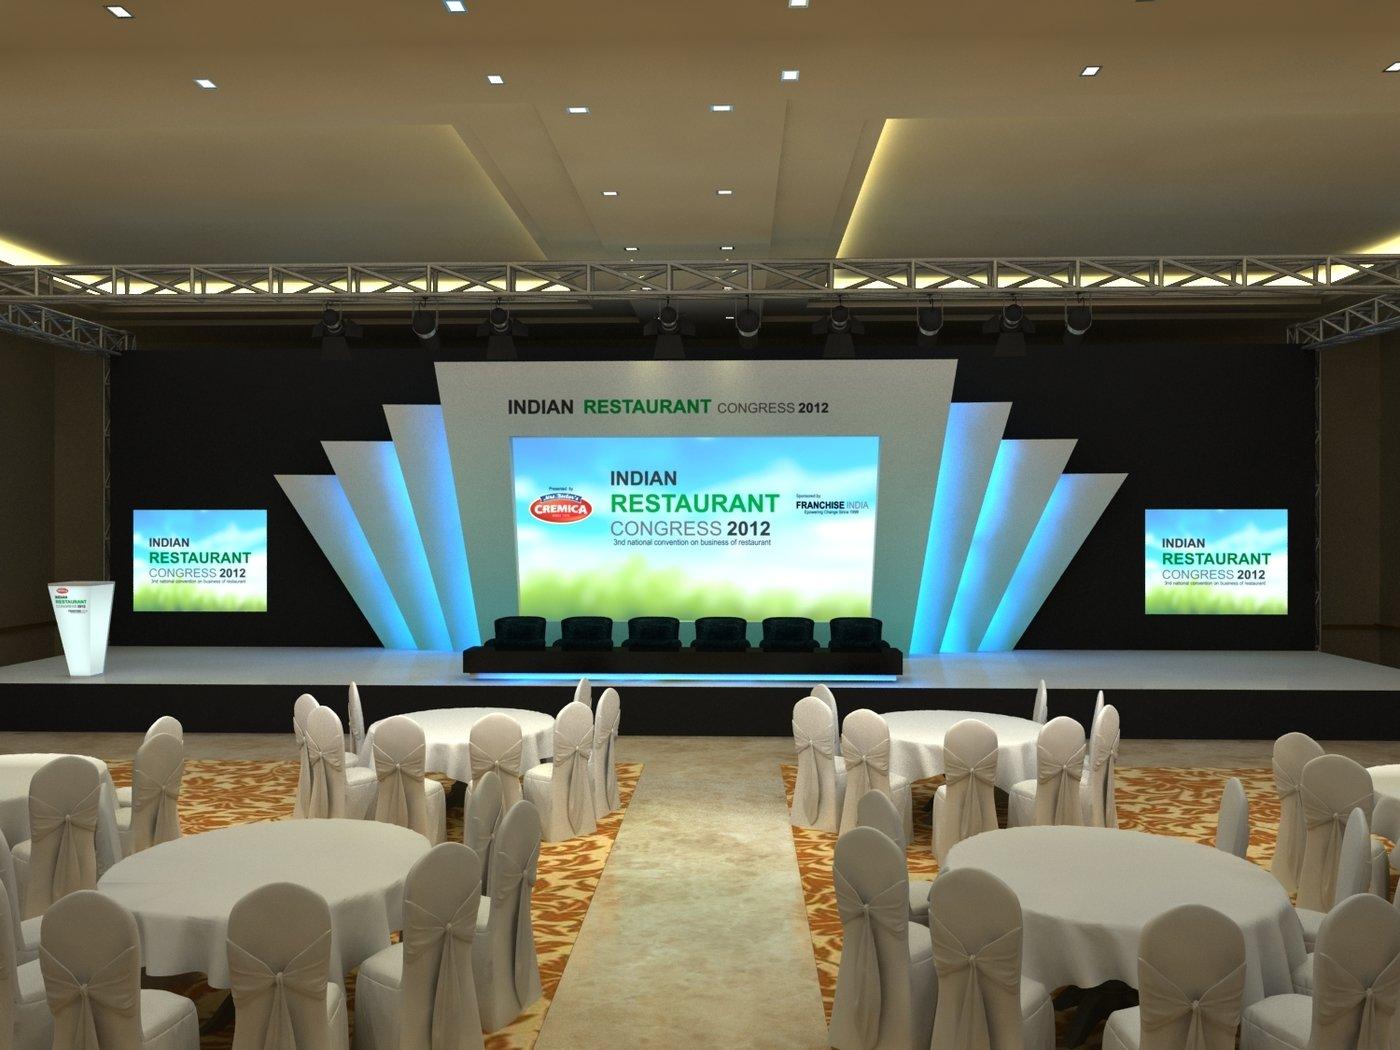 Event Set Design By Dnyansagar Sapkale At